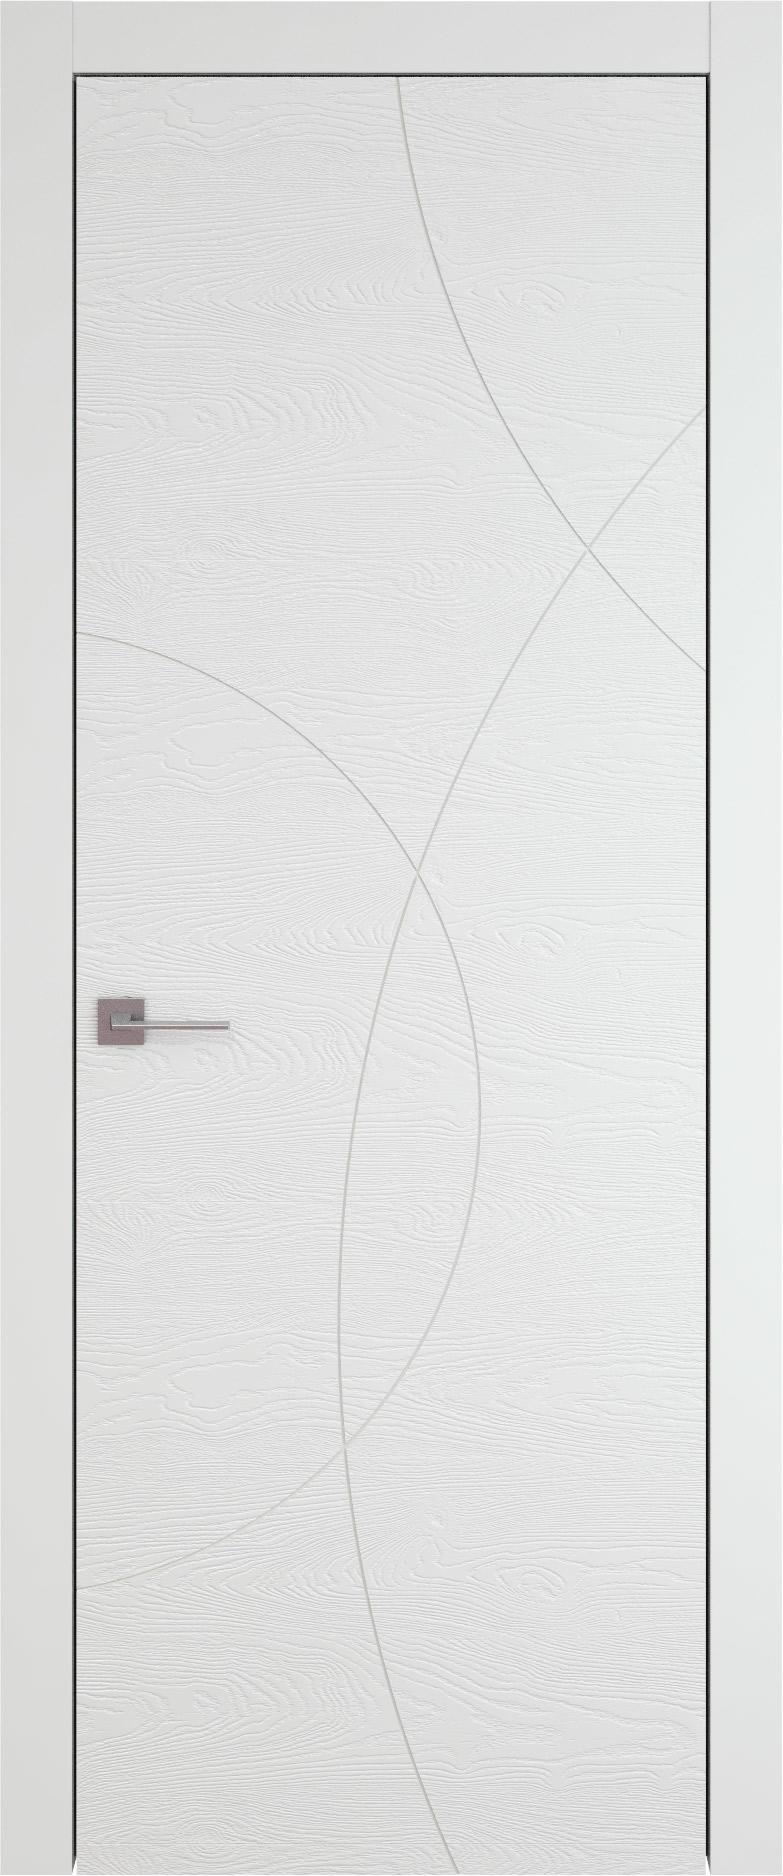 Tivoli Б-5 цвет - Белая эмаль по шпону (RAL 9003) Без стекла (ДГ)